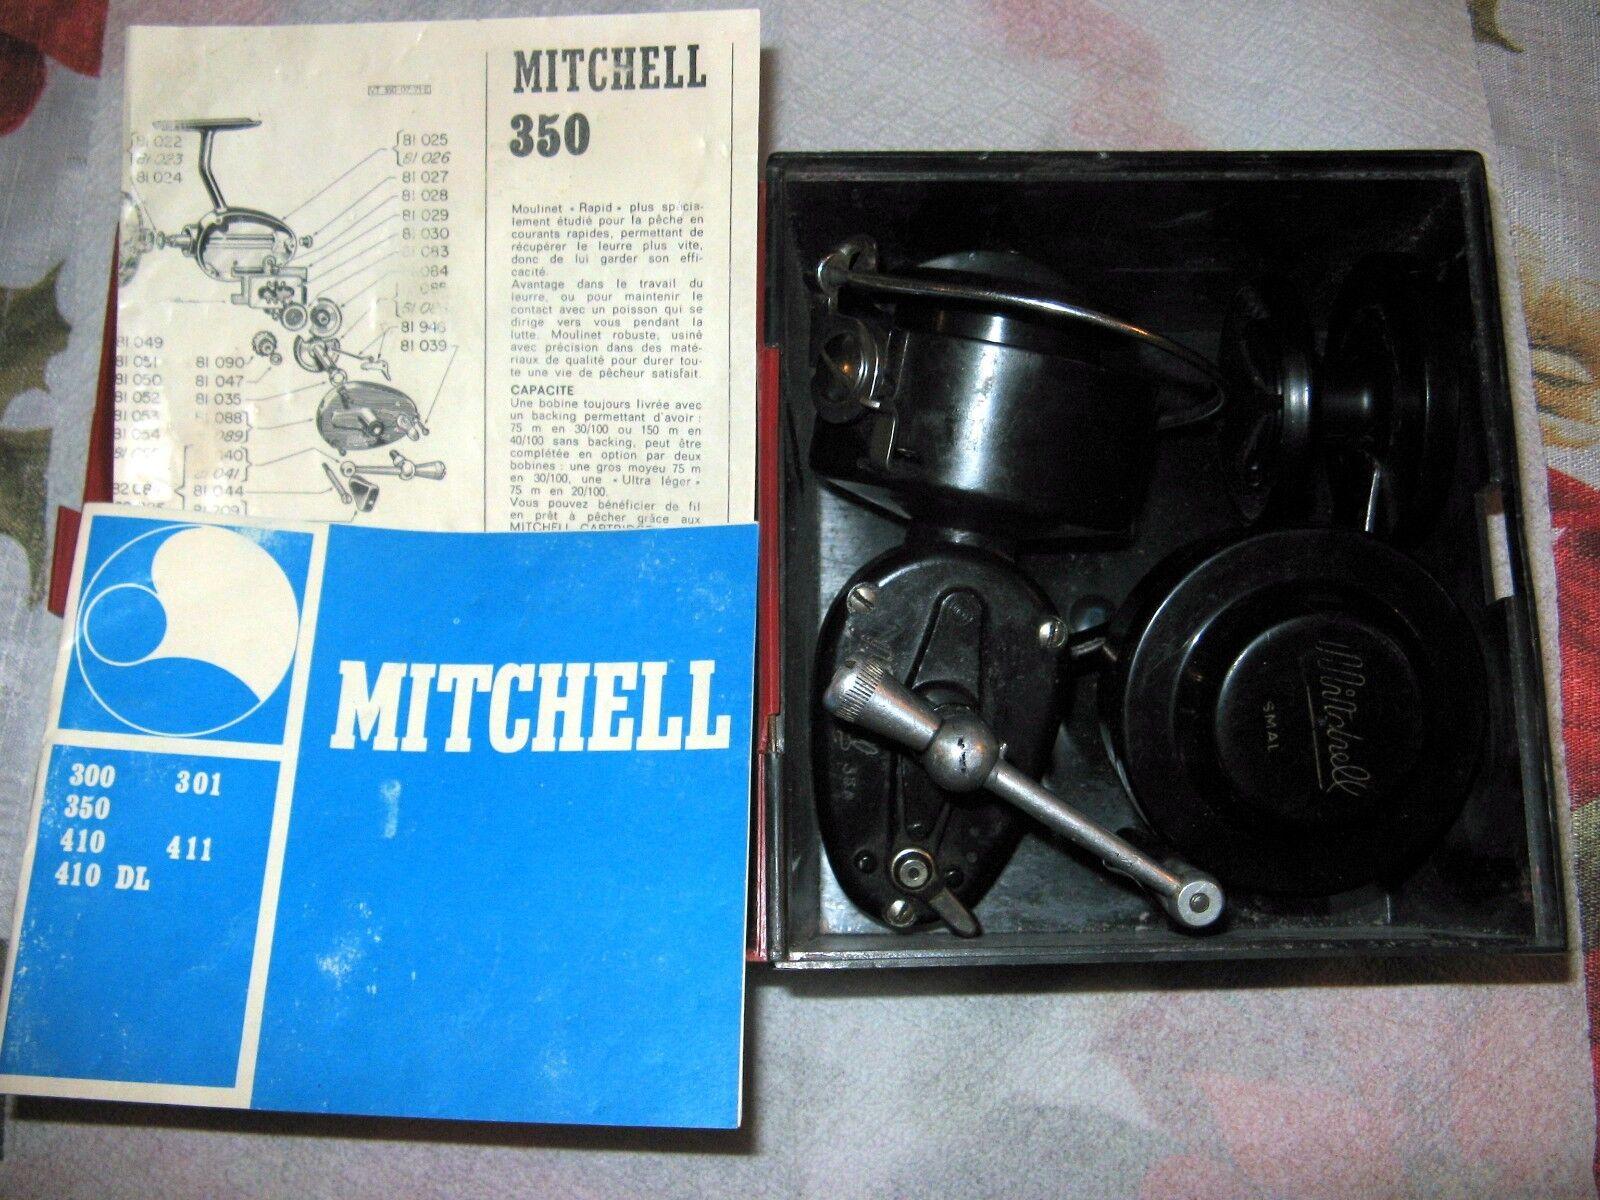 MITCHELL 350 MADE IN FRANCE FISHING REEL 3 rolls rolls rolls aluminum graphite match FULSET 4ea15a